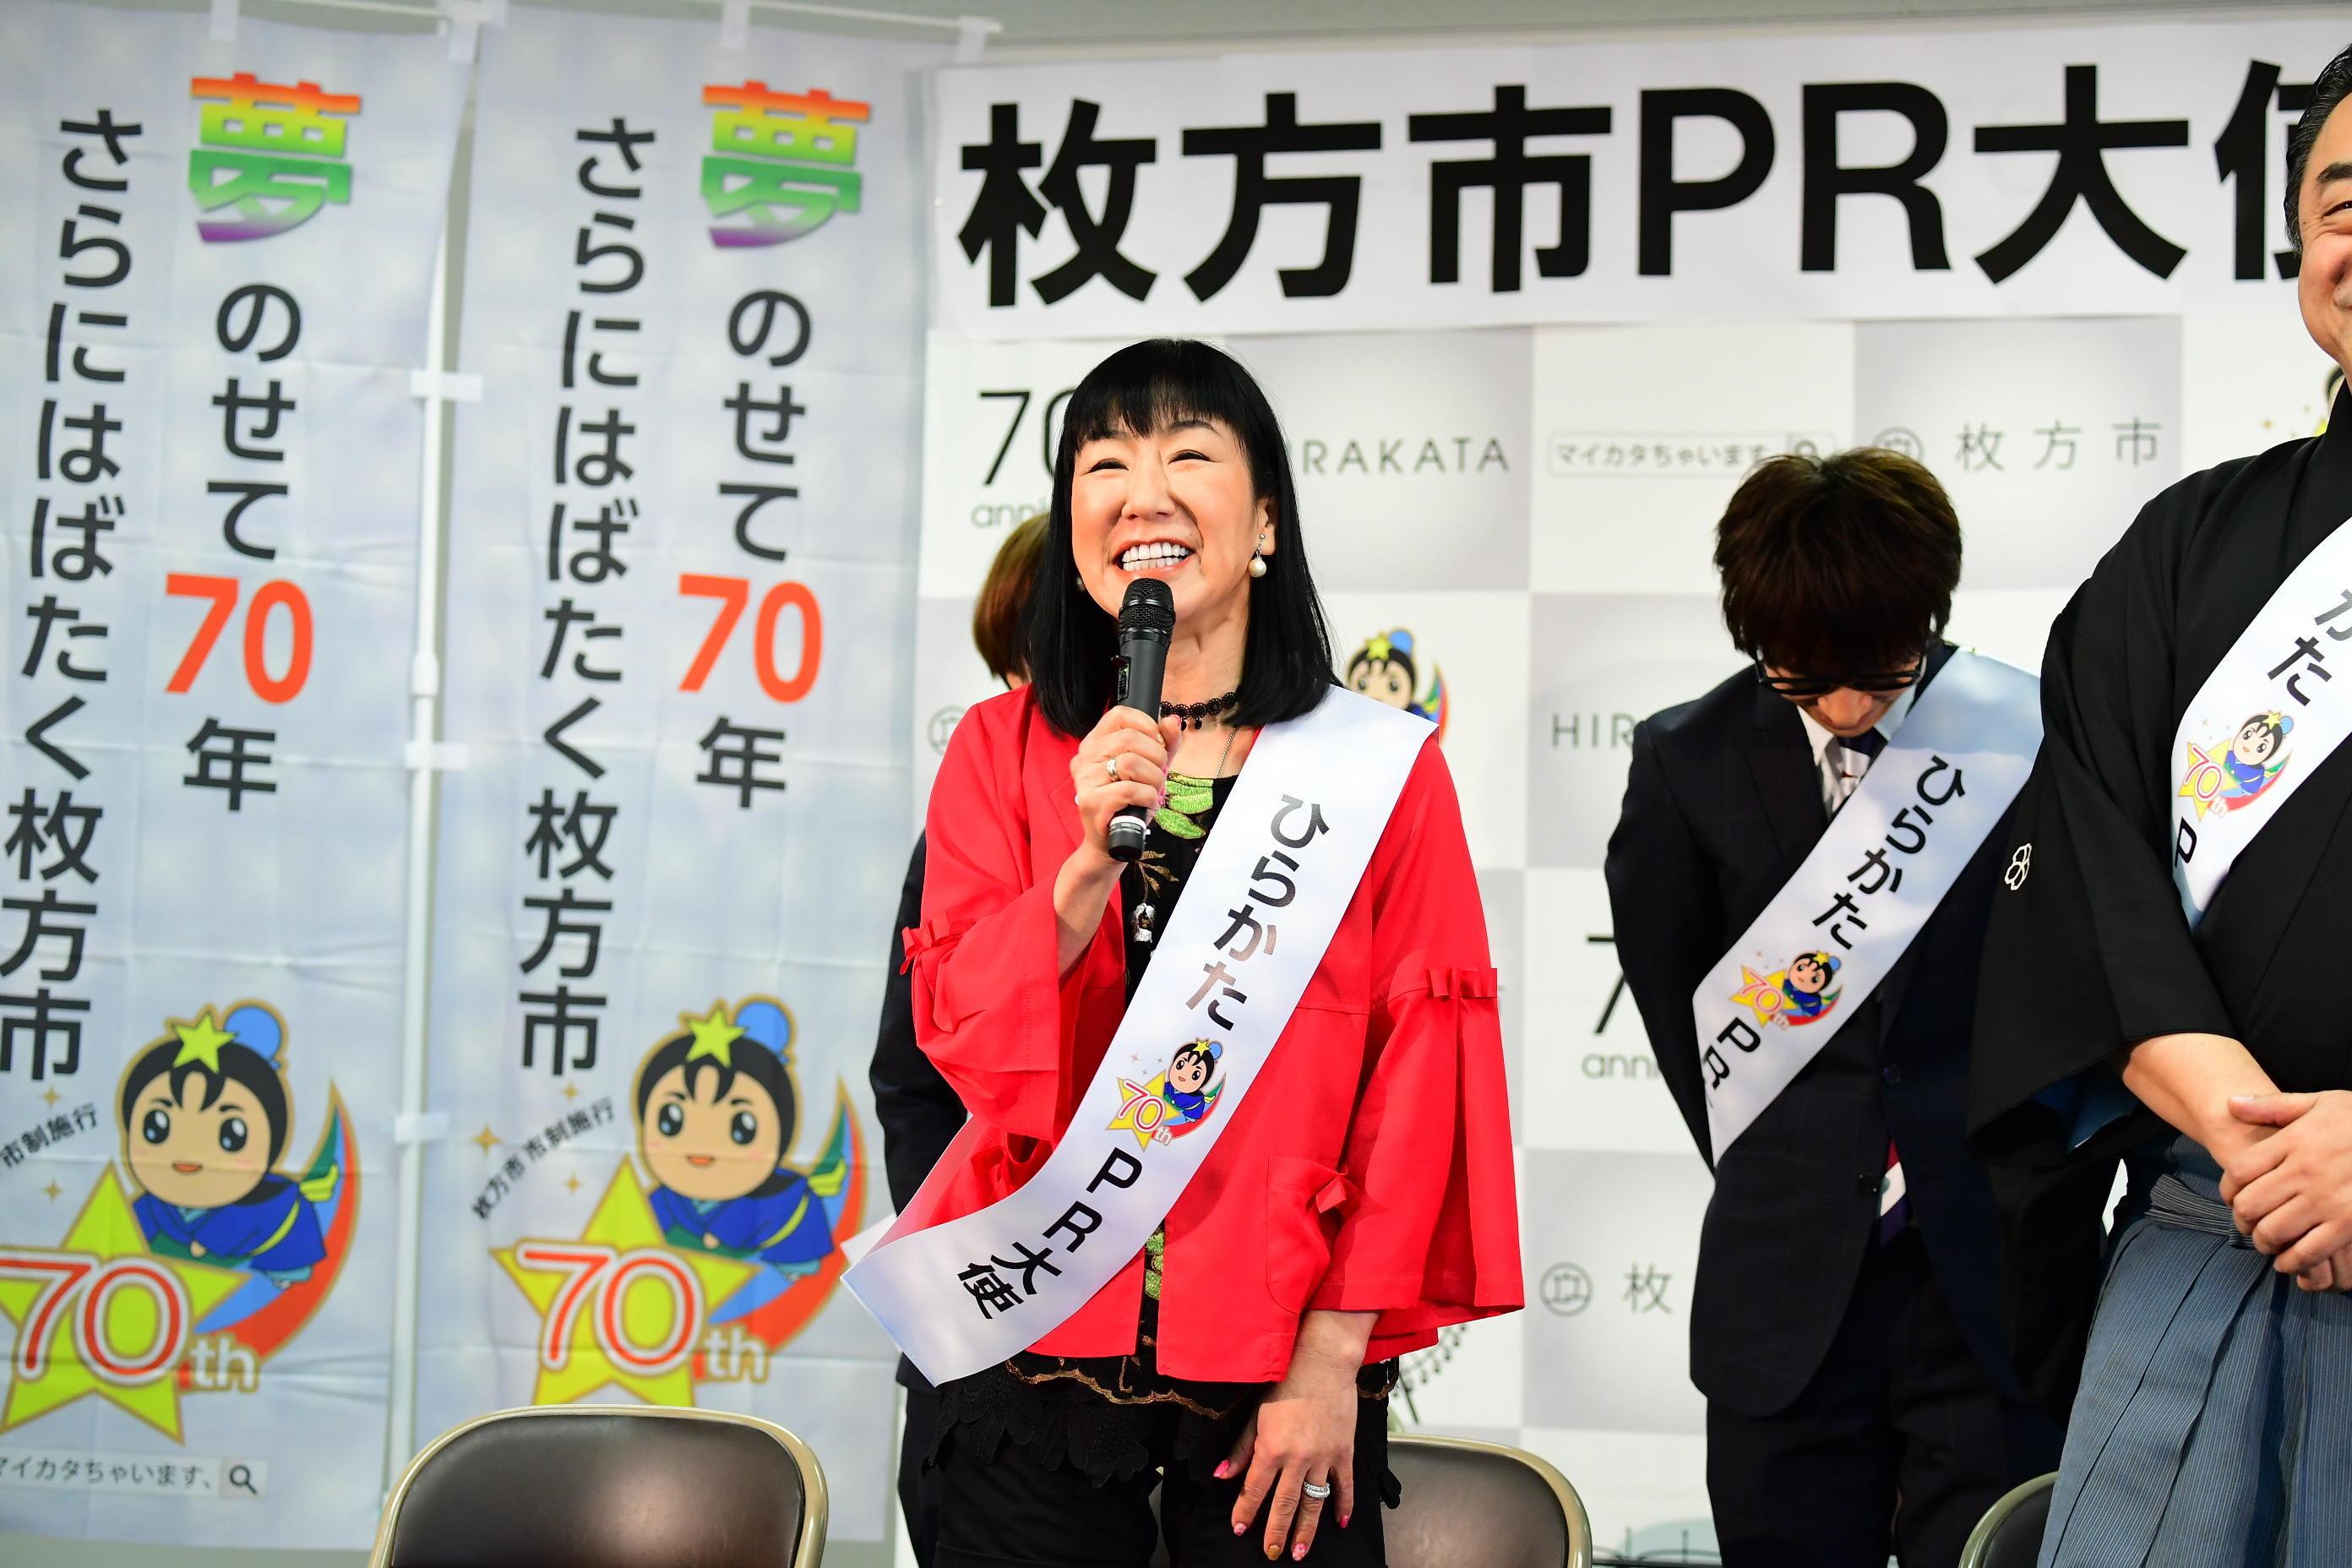 http://news.yoshimoto.co.jp/20170410172744-e6202318368576be7d7c9bada4ff41902ab9a717.jpg